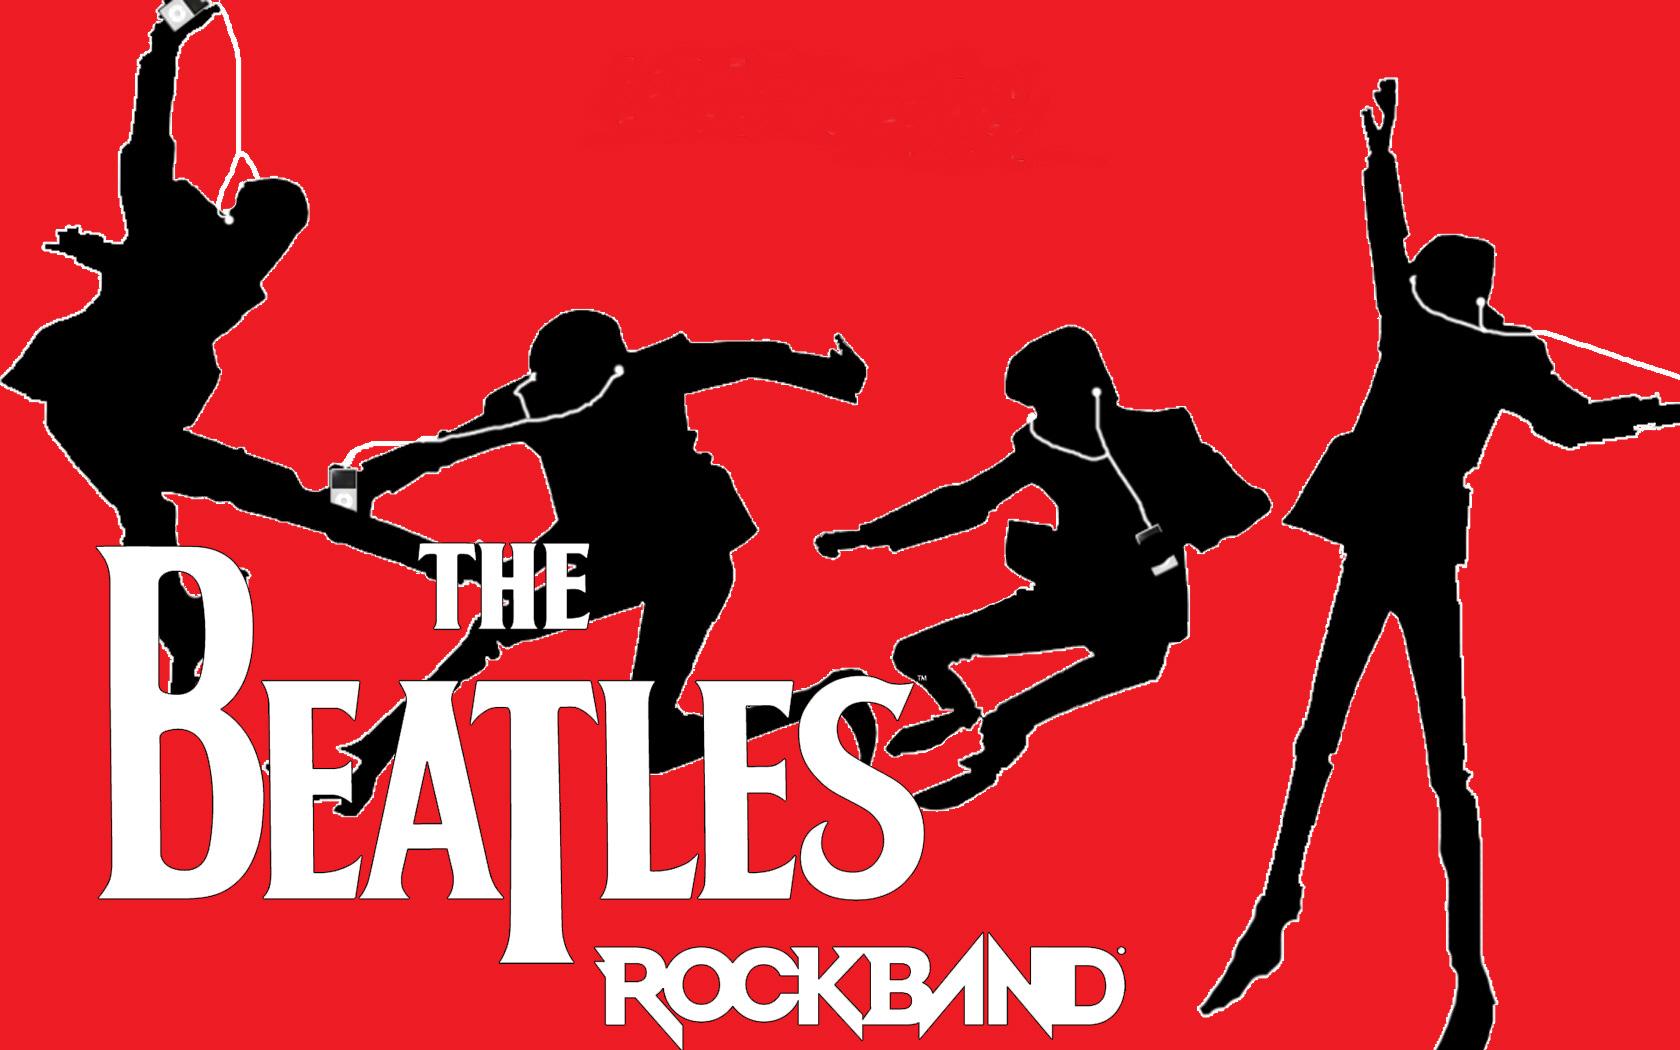 The Beatles Rock Band IPhone Wallpaper